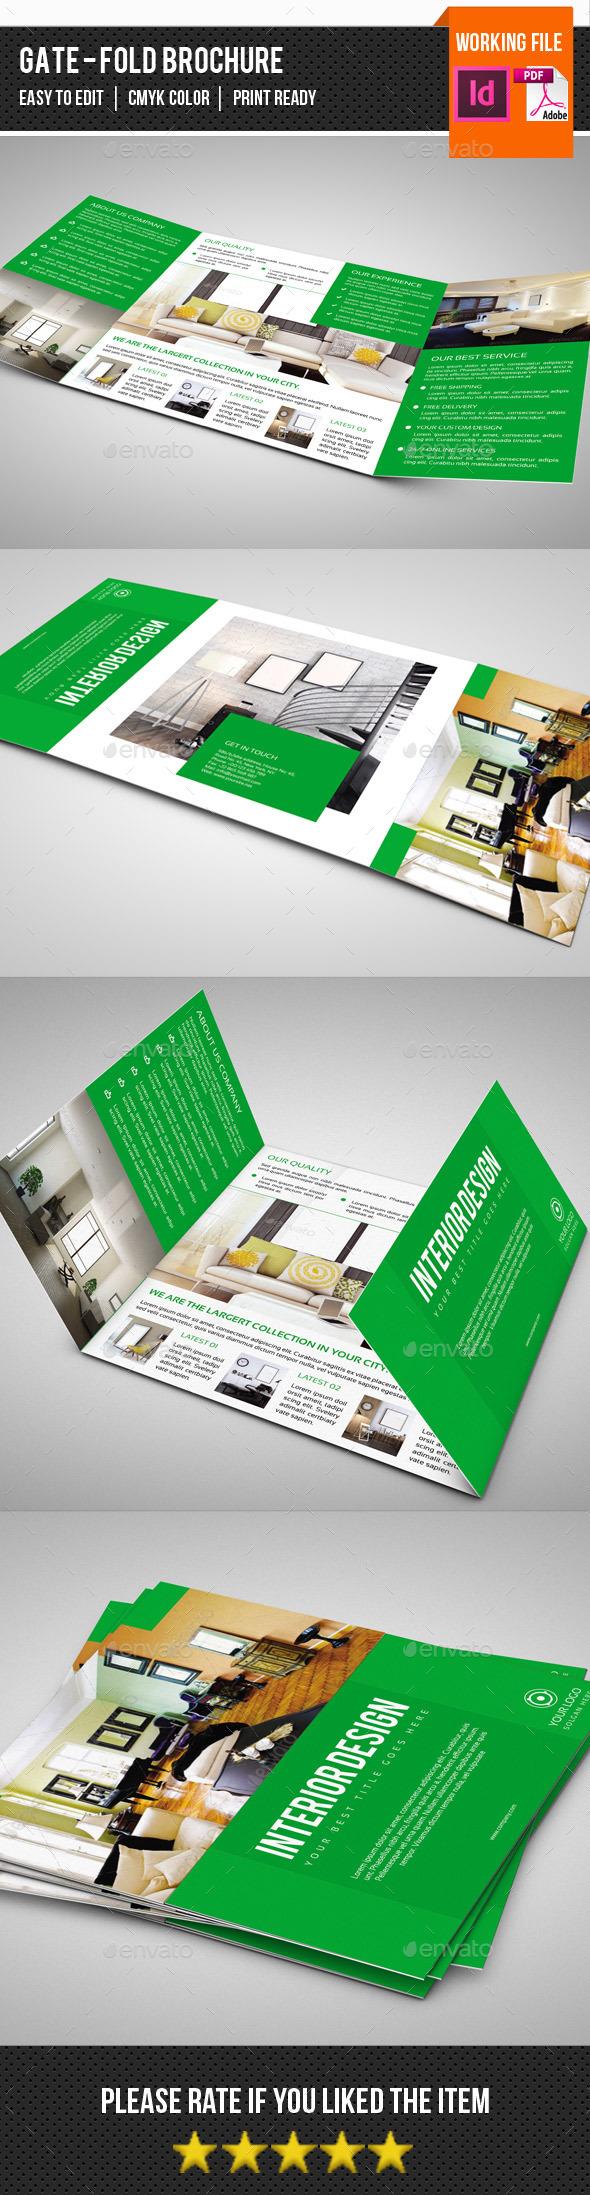 Gatefold Interior Brochure-V03 - Corporate Brochures